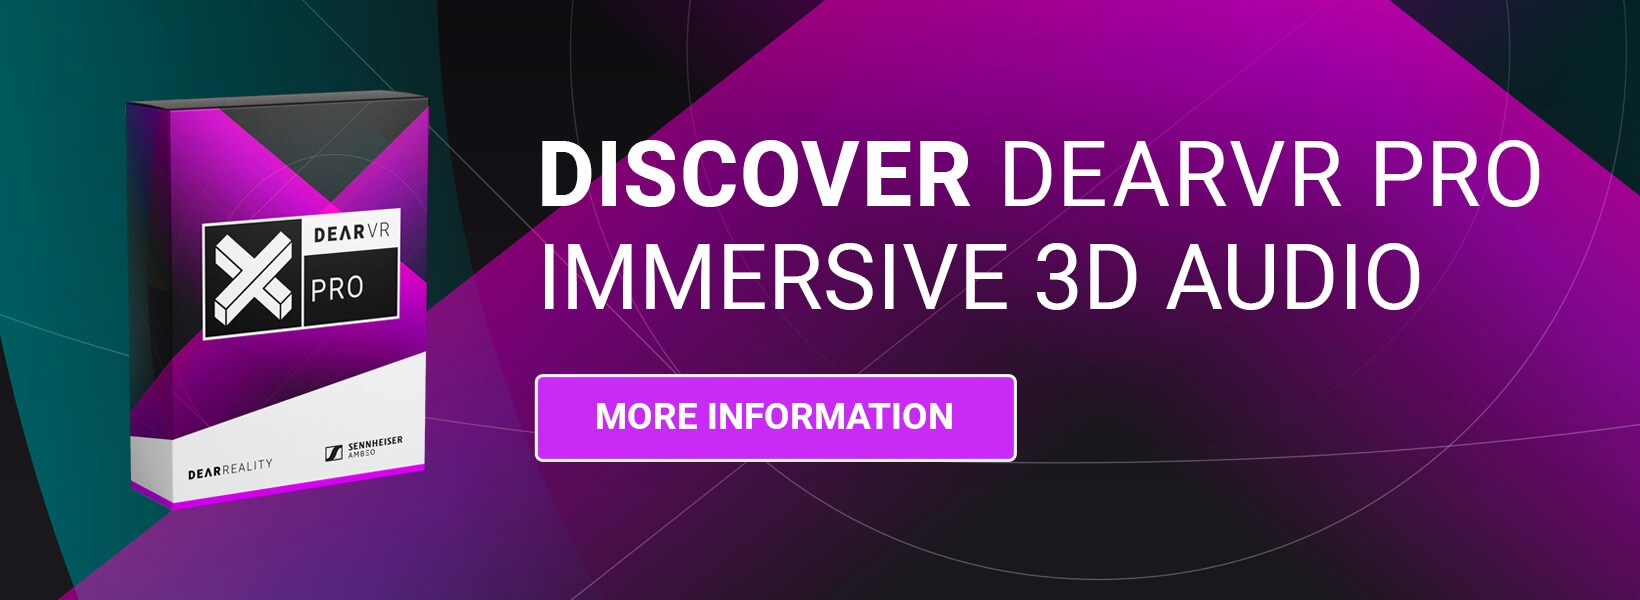 Discover dearVR PRO